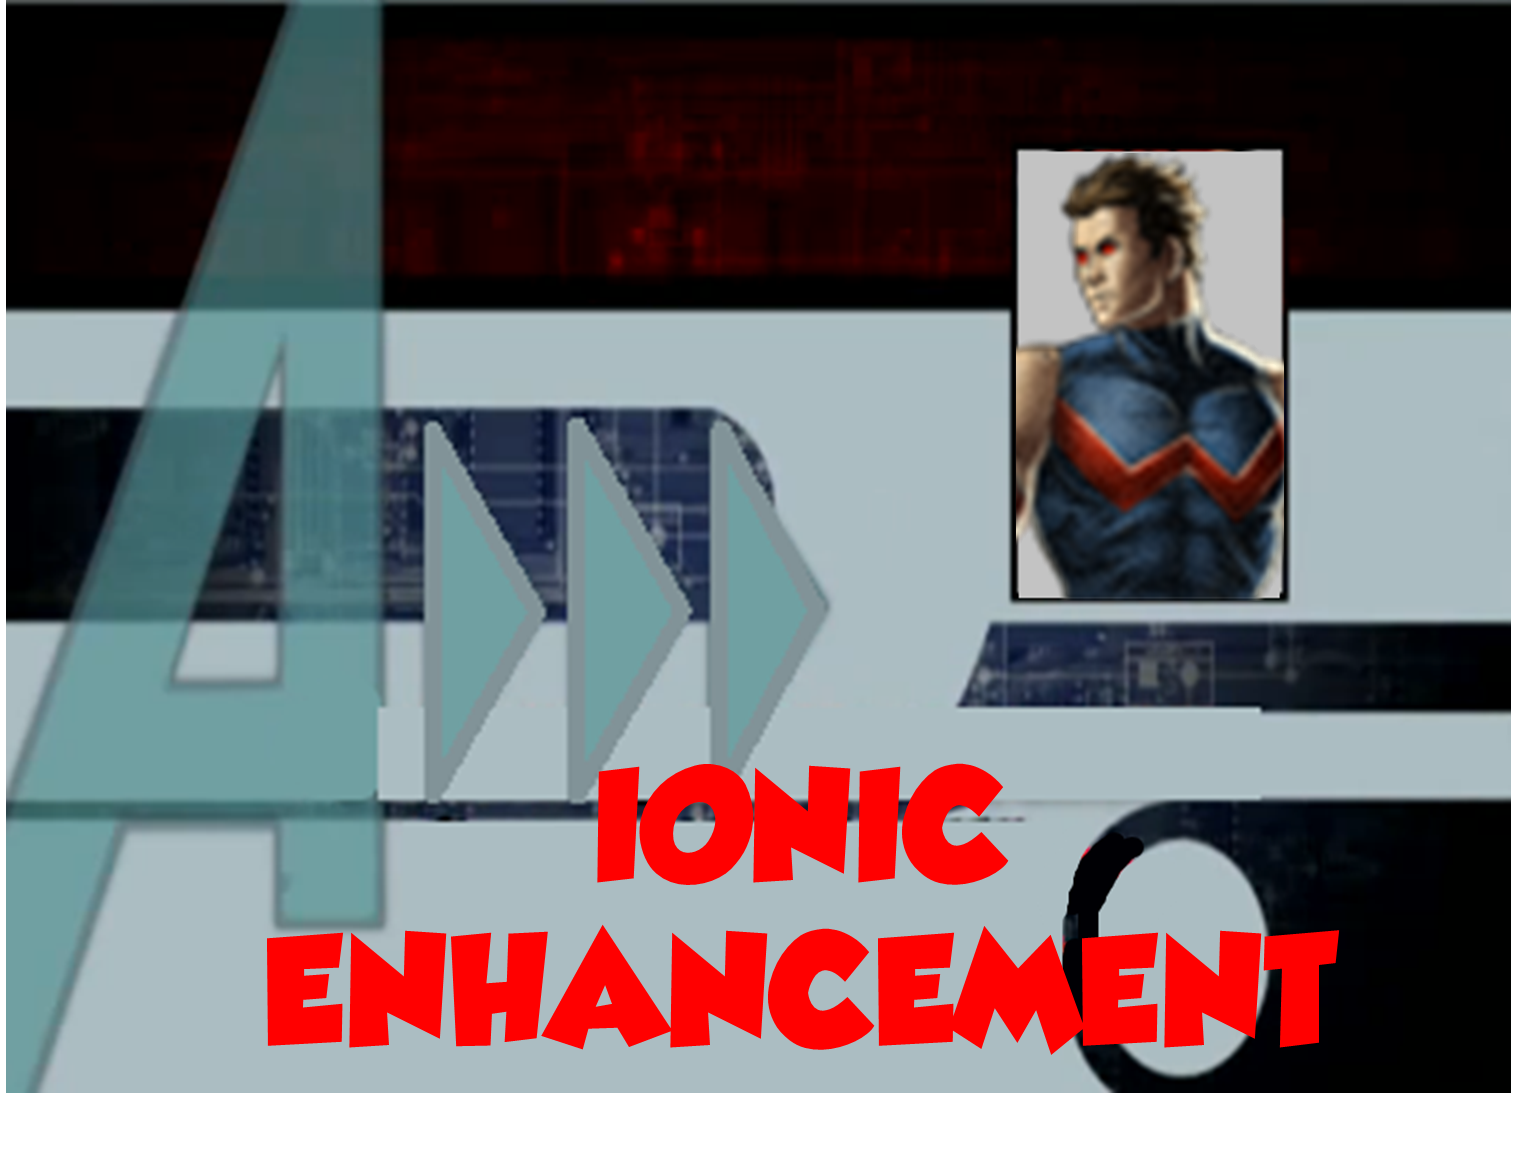 Ionic Enhancement (A!)